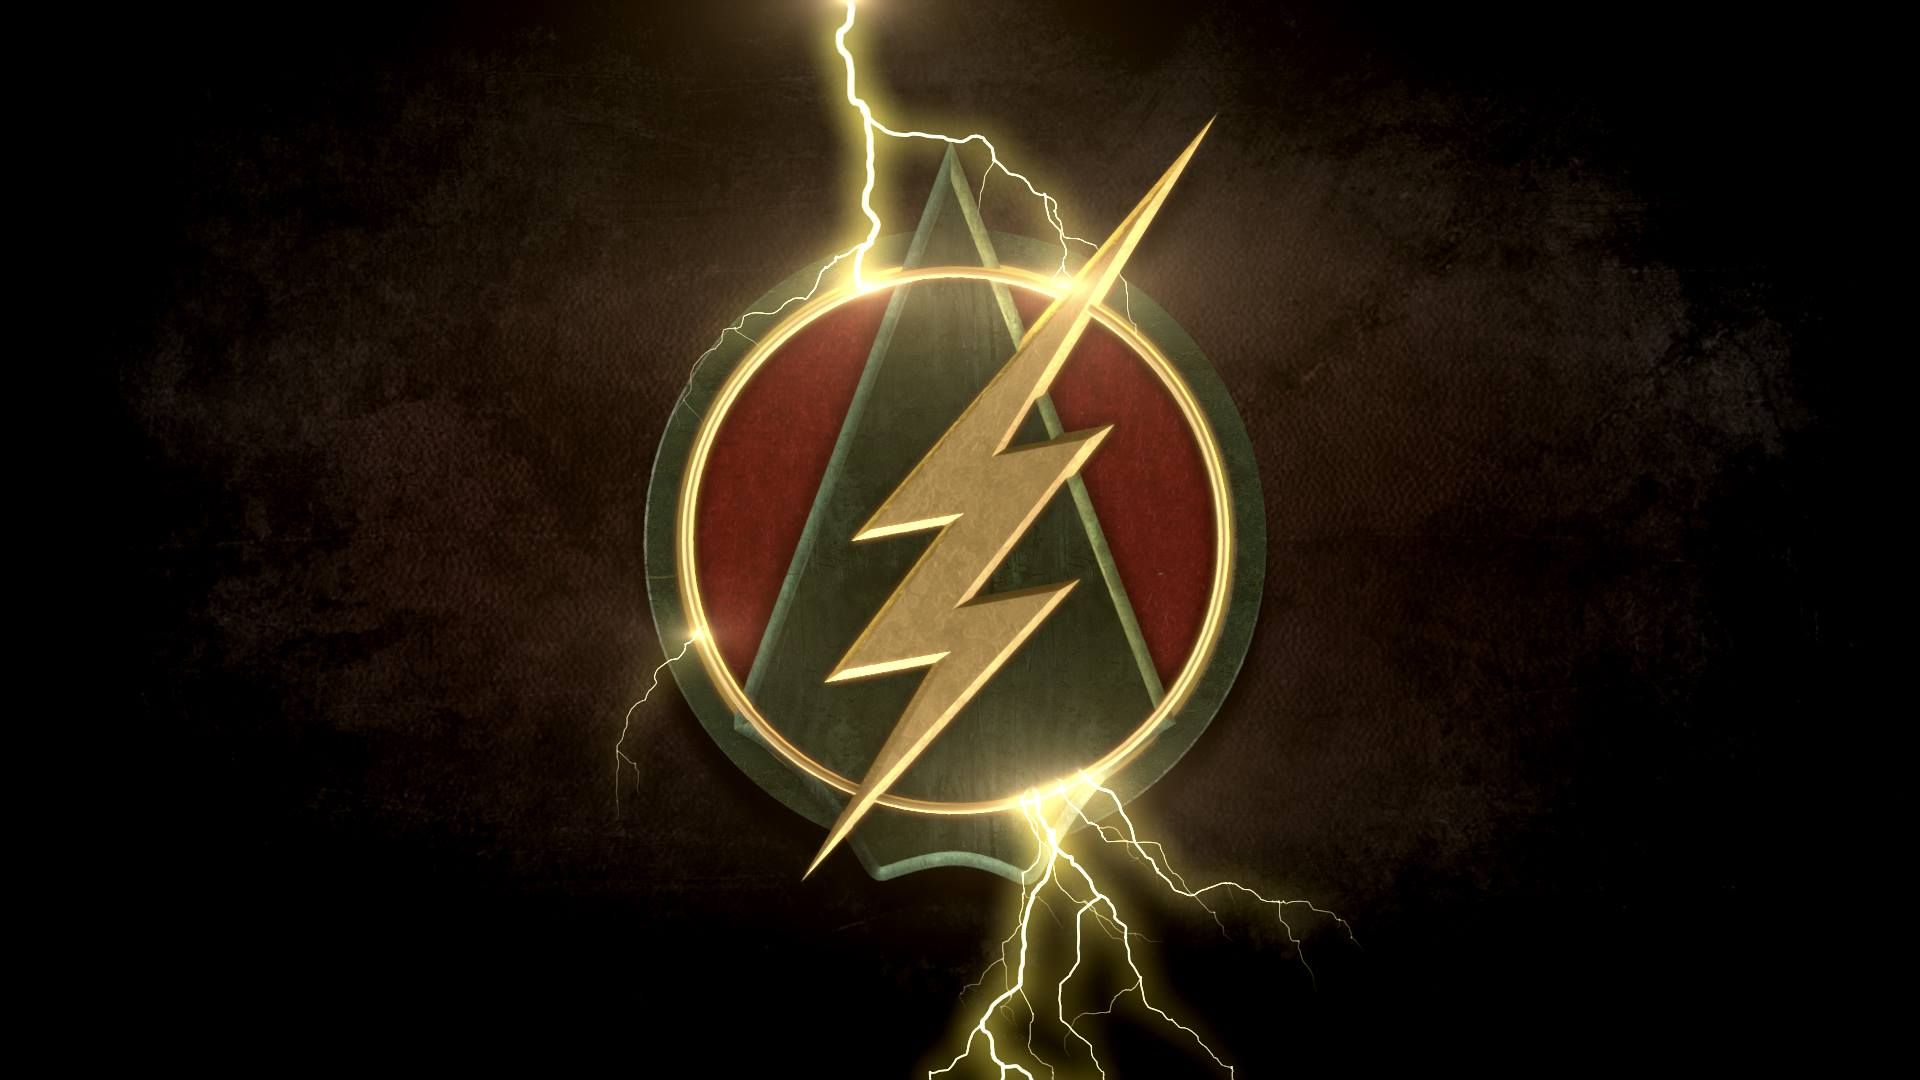 The Flash And Arrow Logo Flash Wallpaper Flash Arrow The Flash